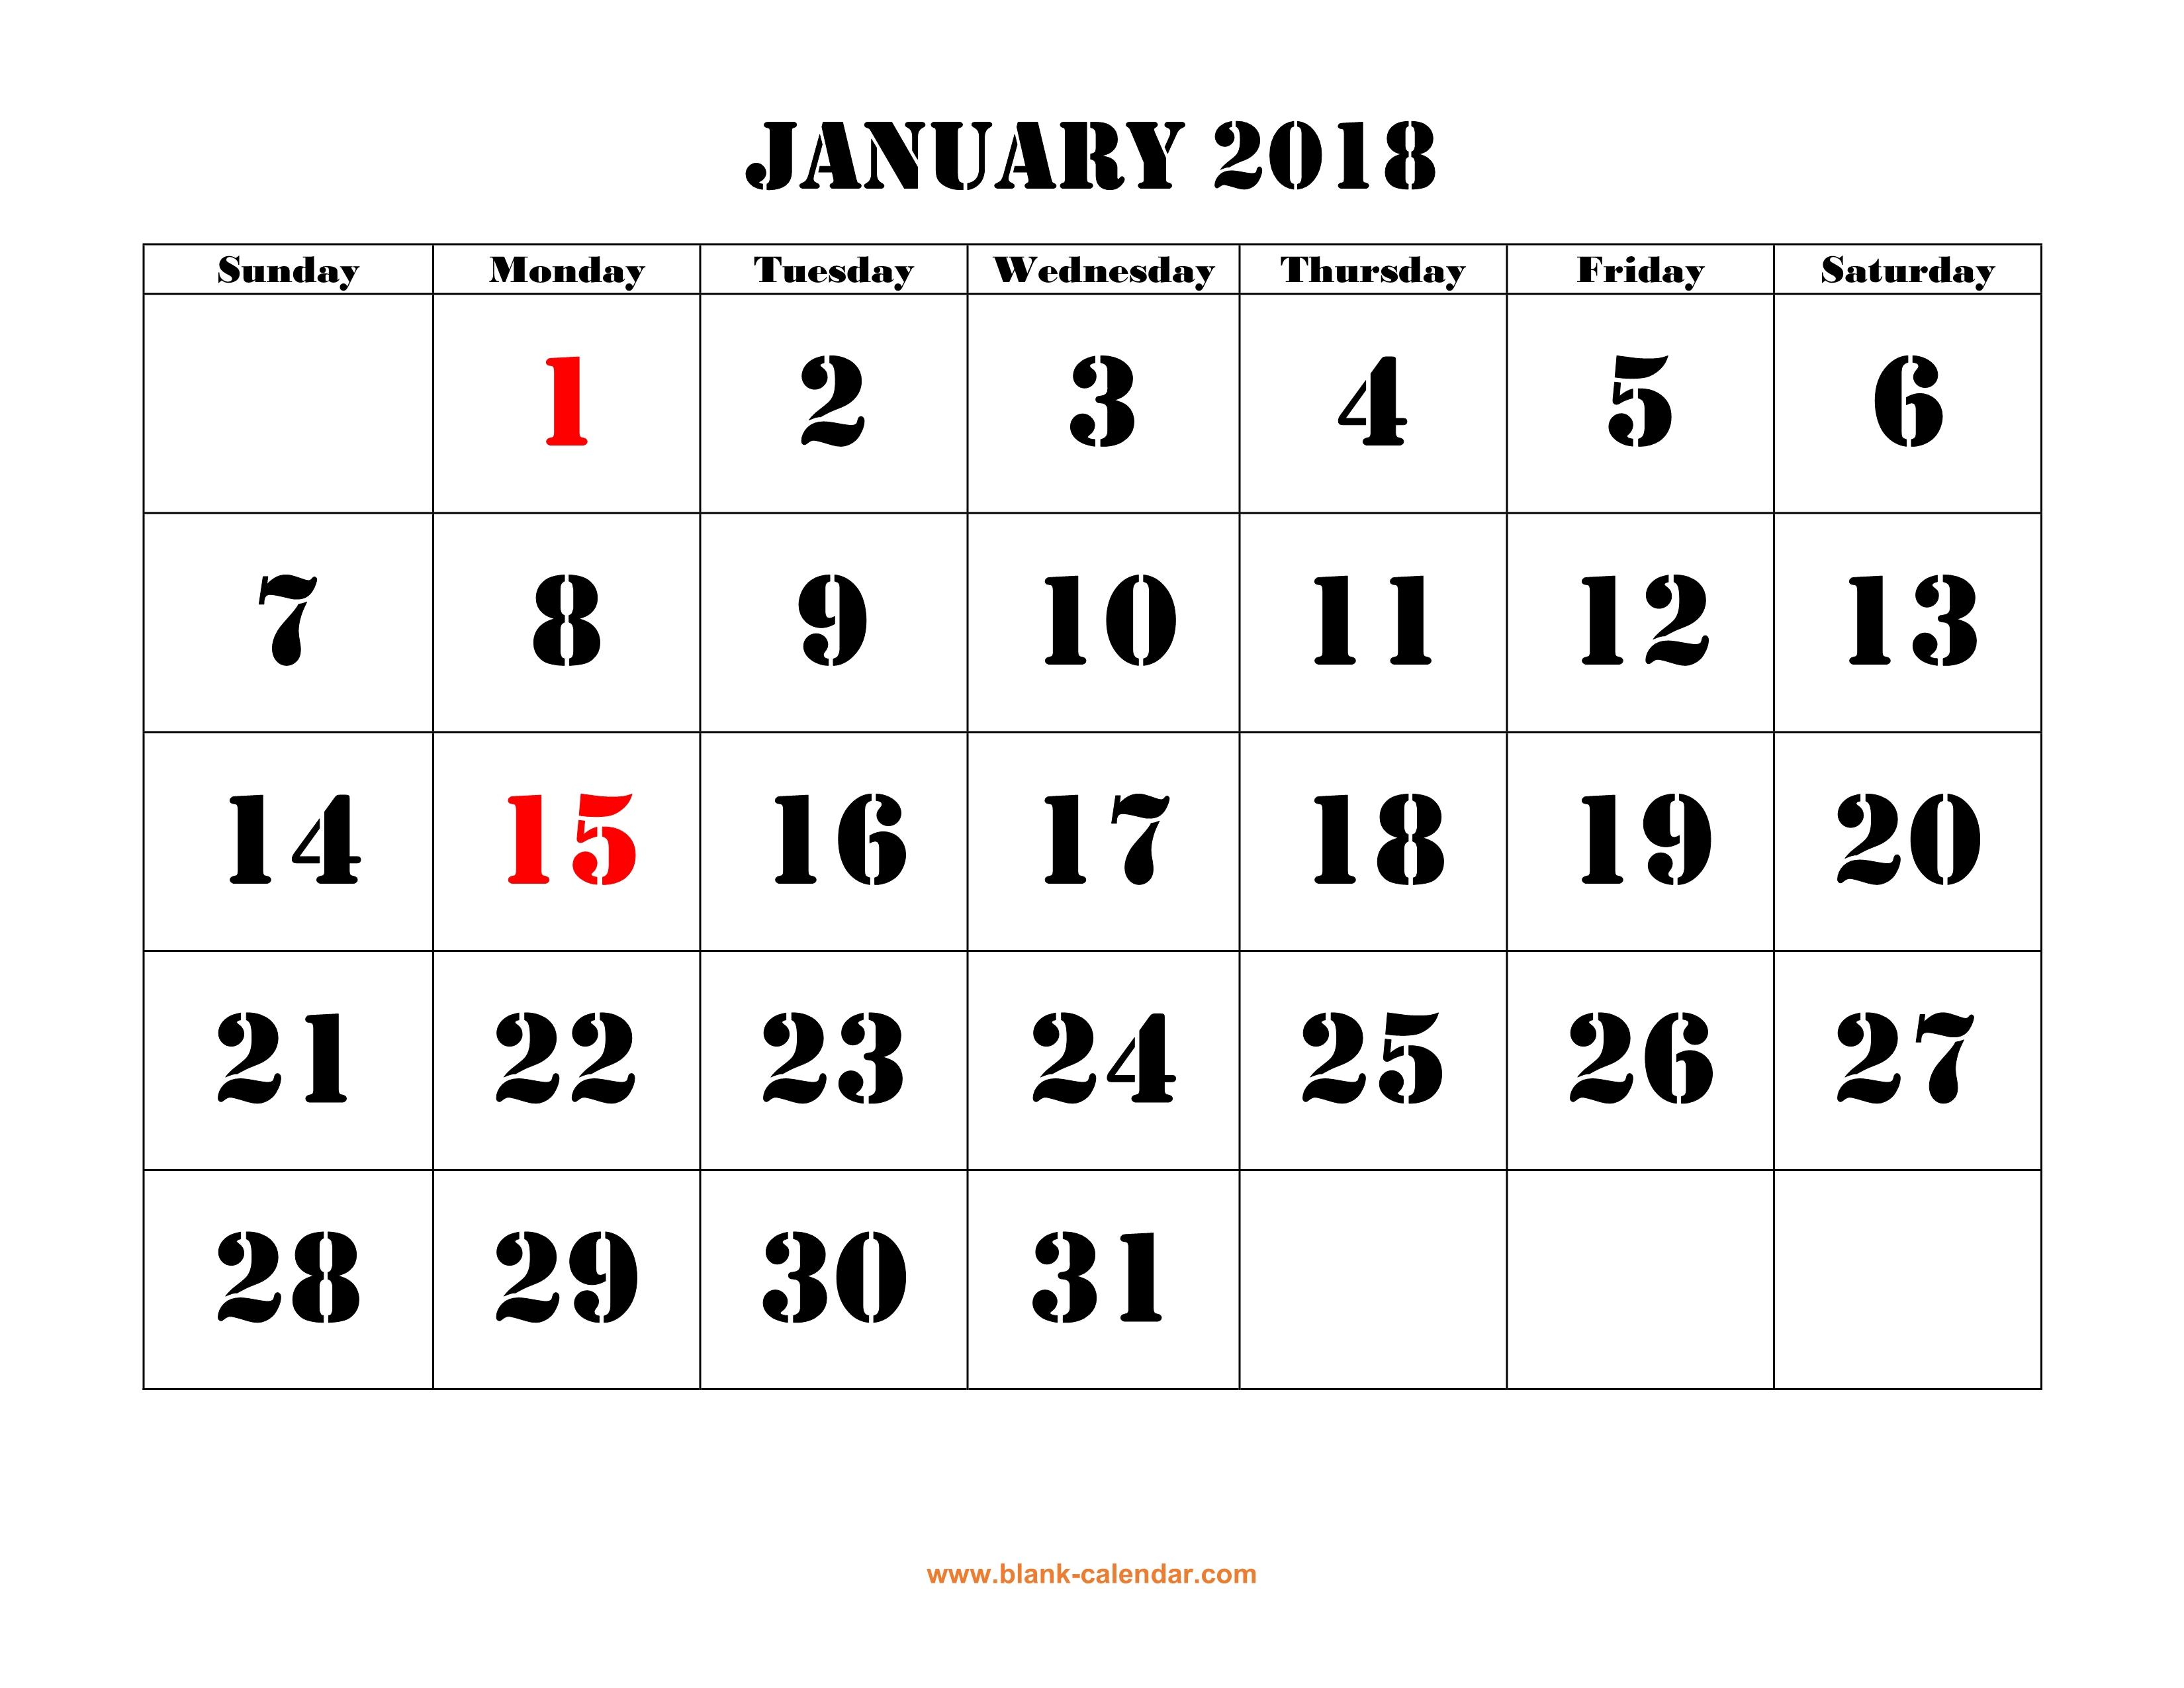 Blank Horizontal Calendar : Free download printable january calendar large font